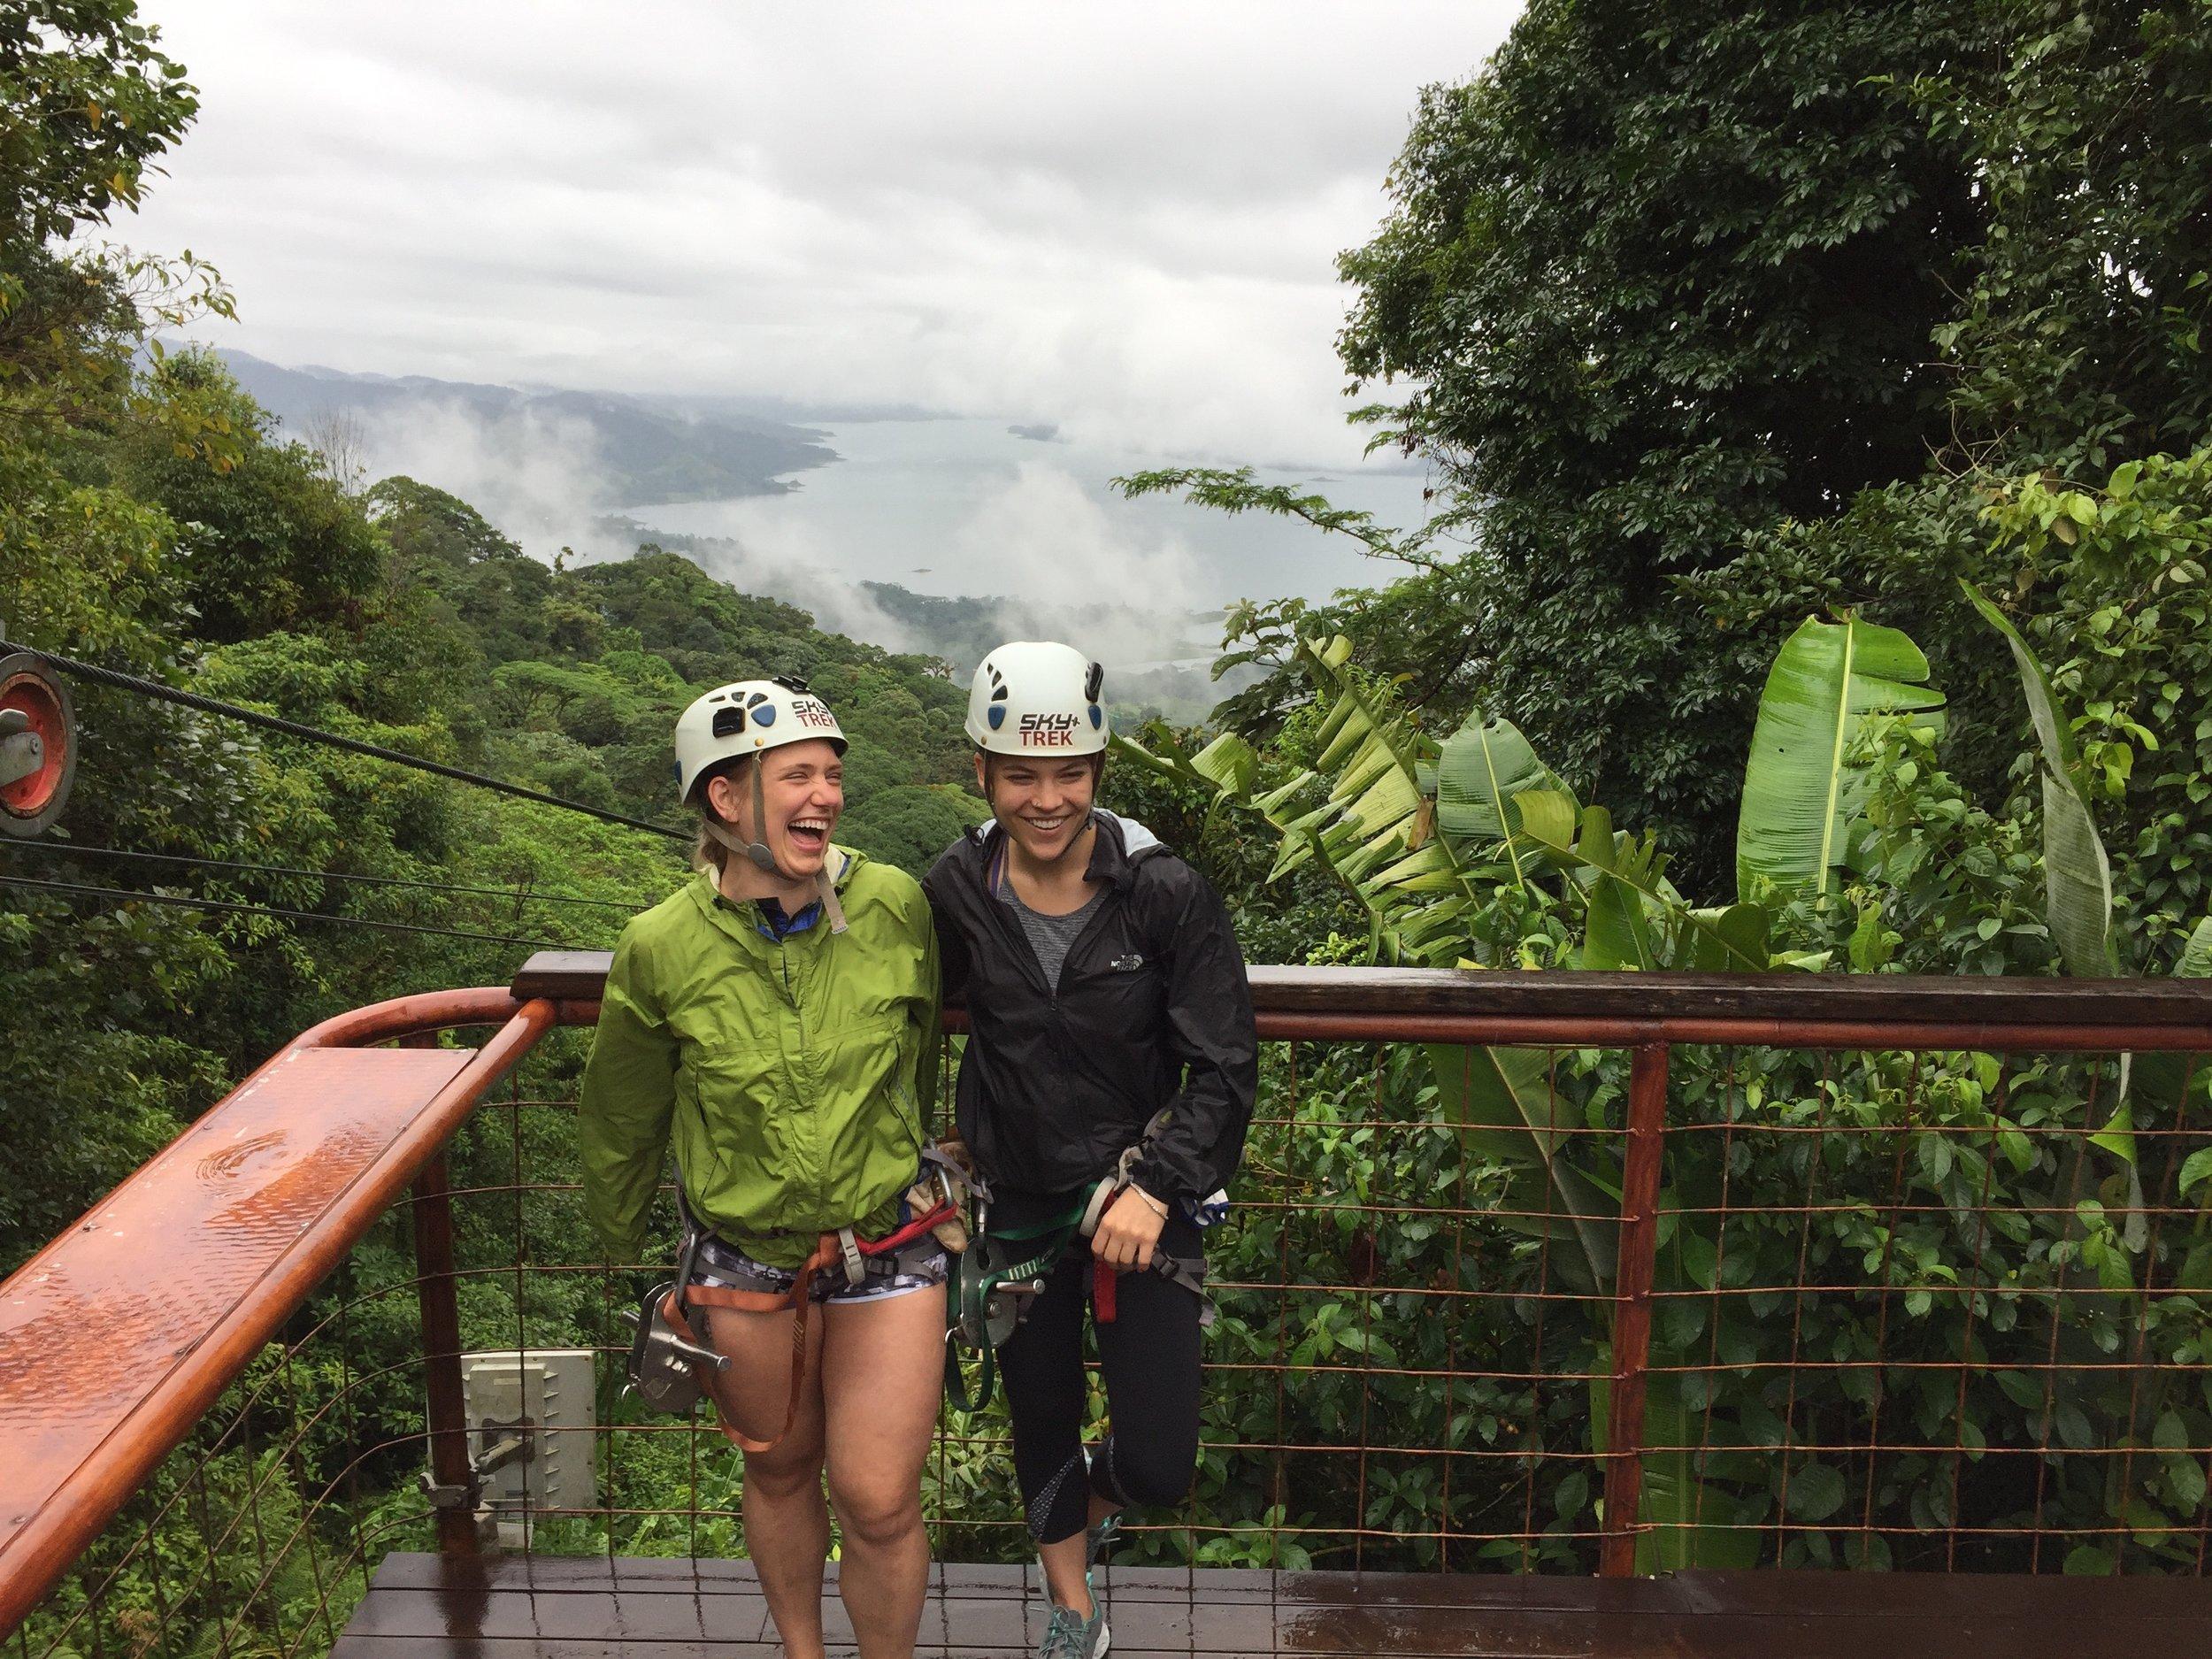 Ziplining at Arenal National Park